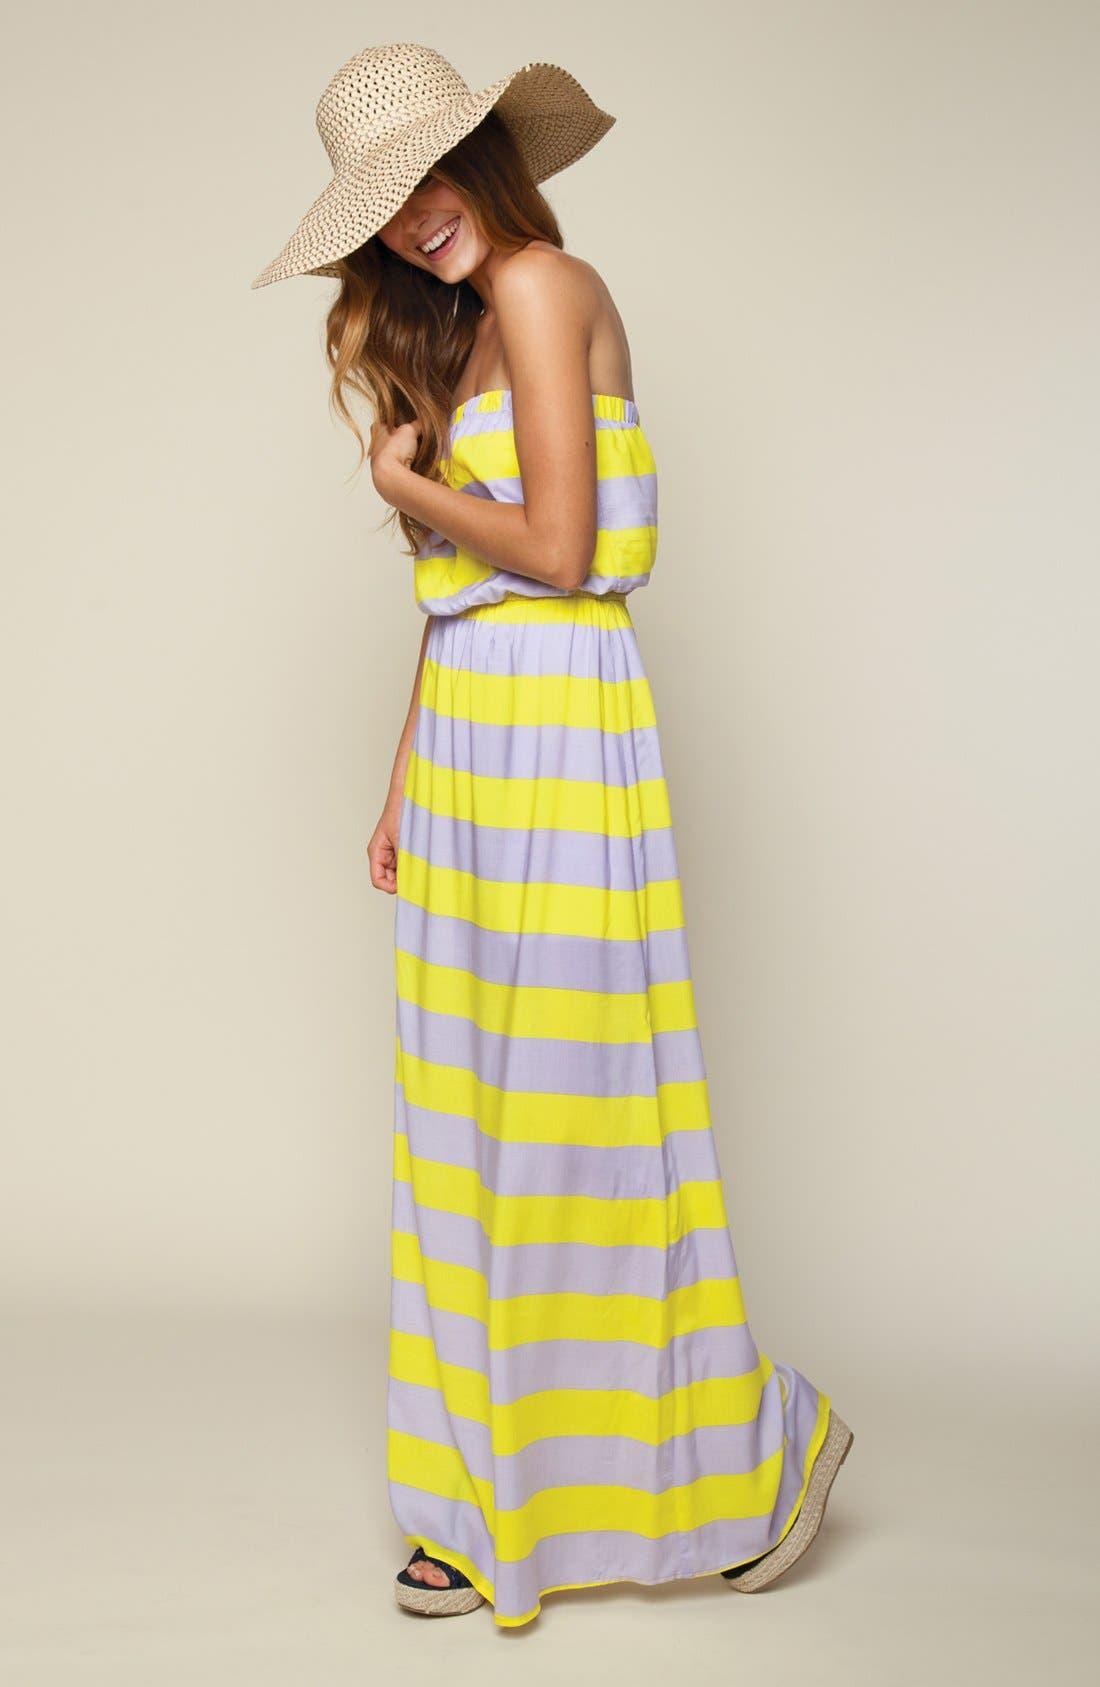 Main Image - Splendid Stripe Maxi Dress & Accessories